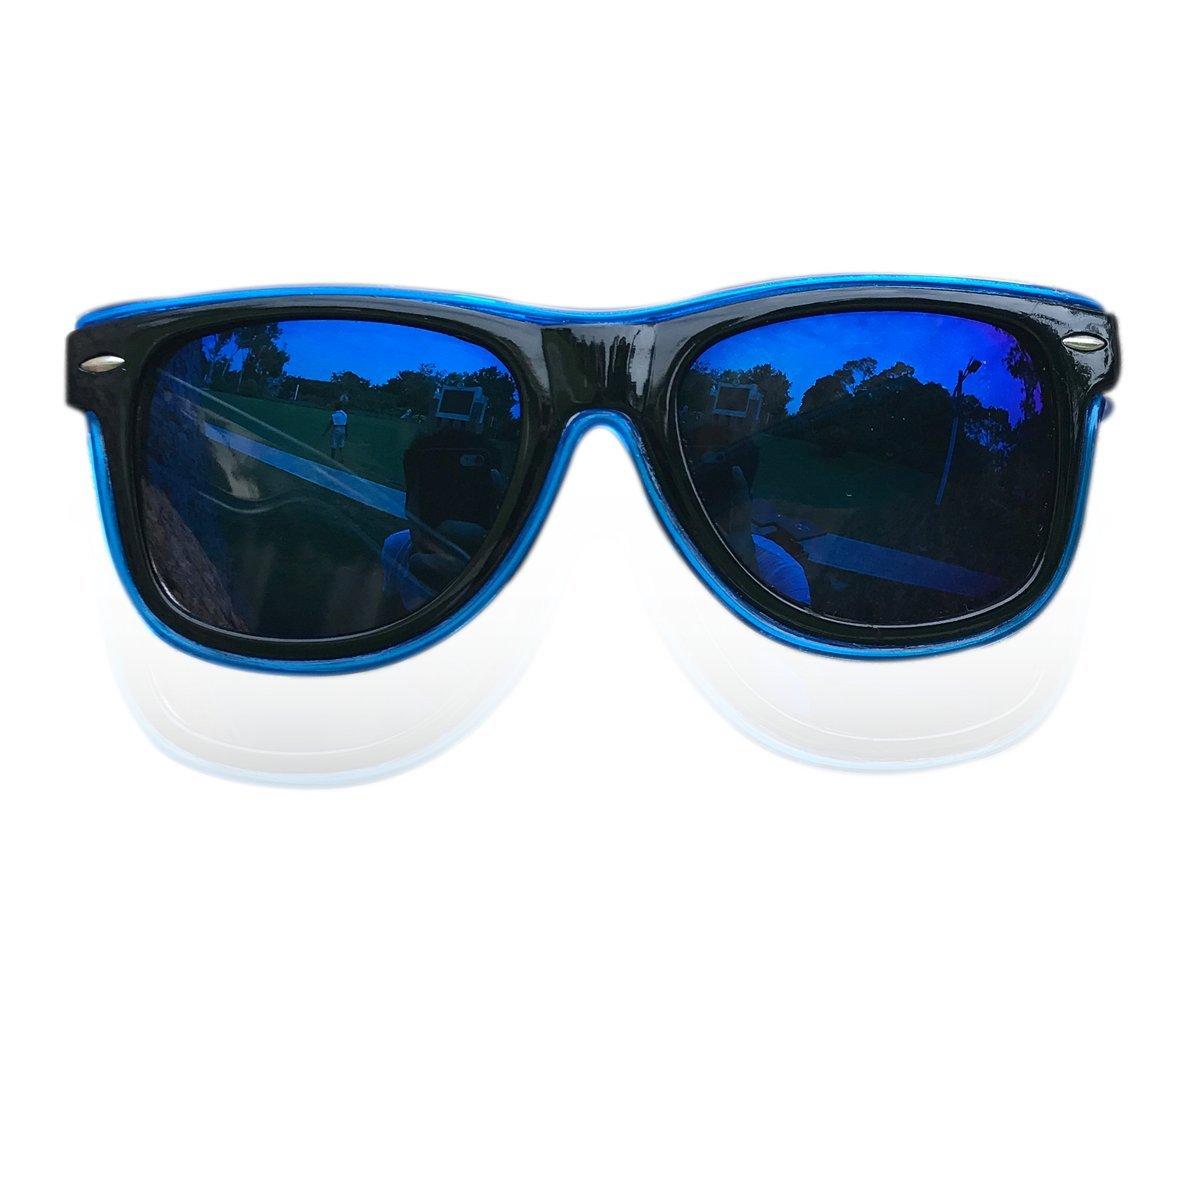 Light Up Sunglasses Multicolor Lens El Wire Wayfarer Glasses Sound Activated Led Flashing Glasses (Blue, Blue)